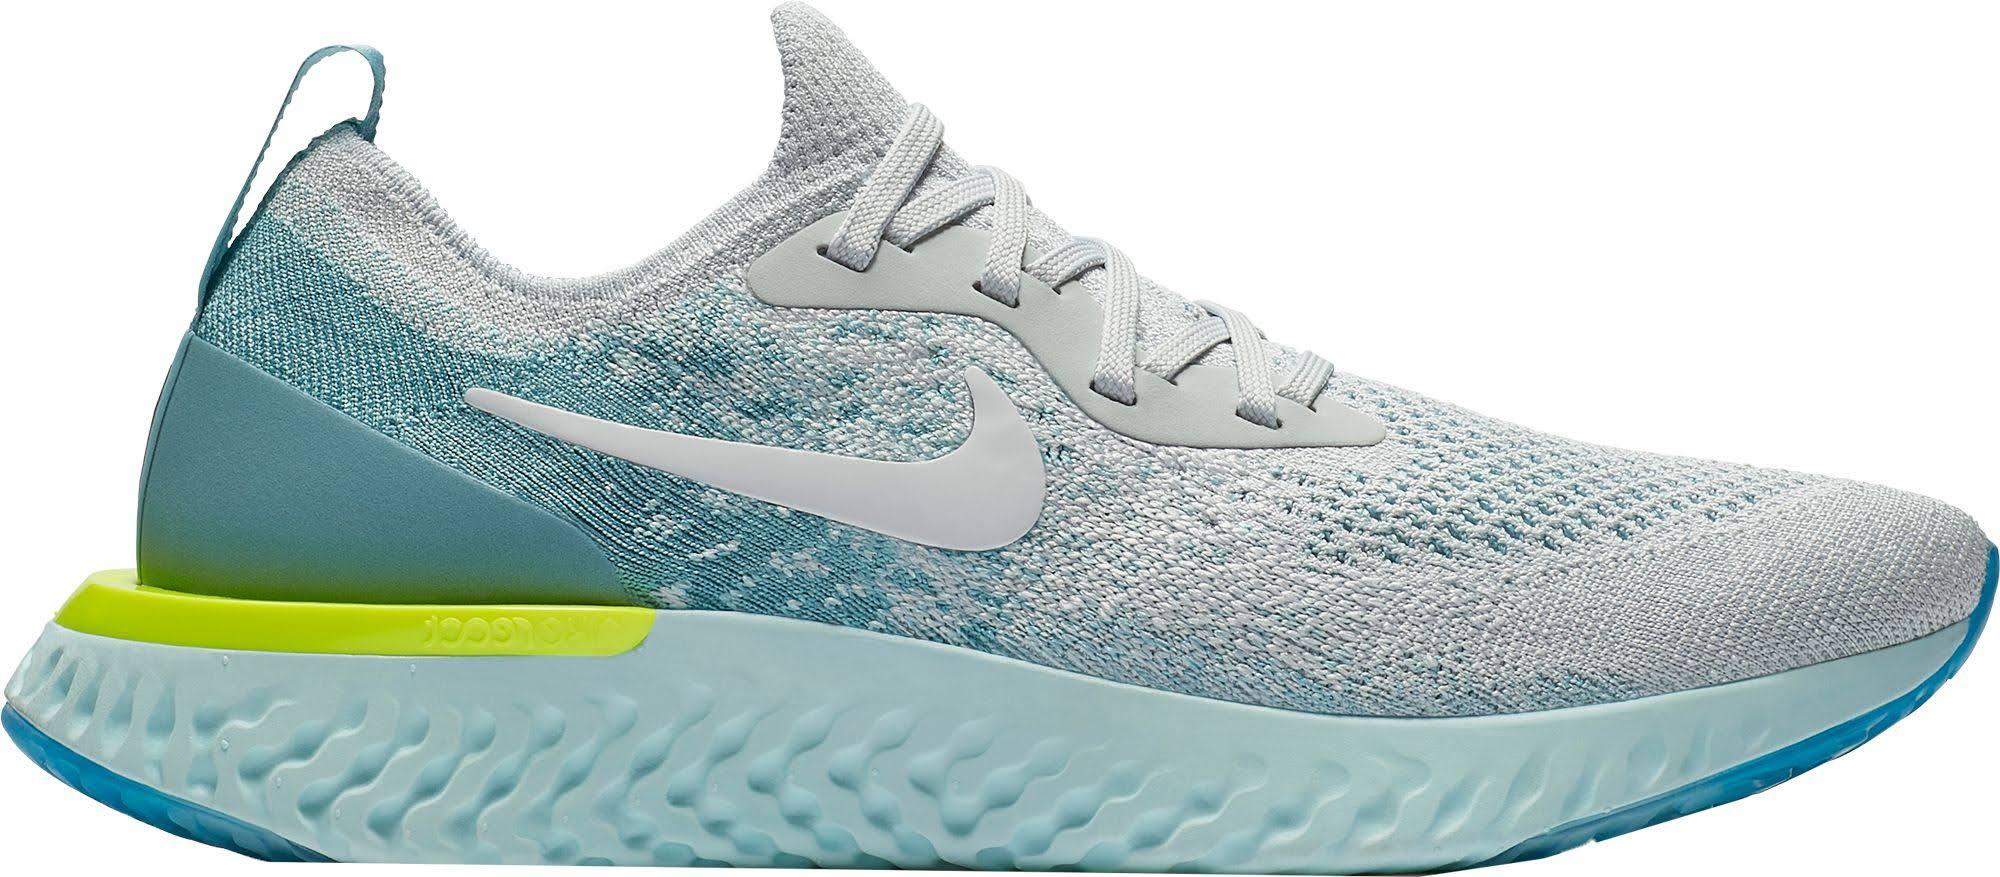 Nike Epic Aq0070008 Para Flyknit Mujer React 10 Zapatillas Running De Tamaño rrBpT1qwd